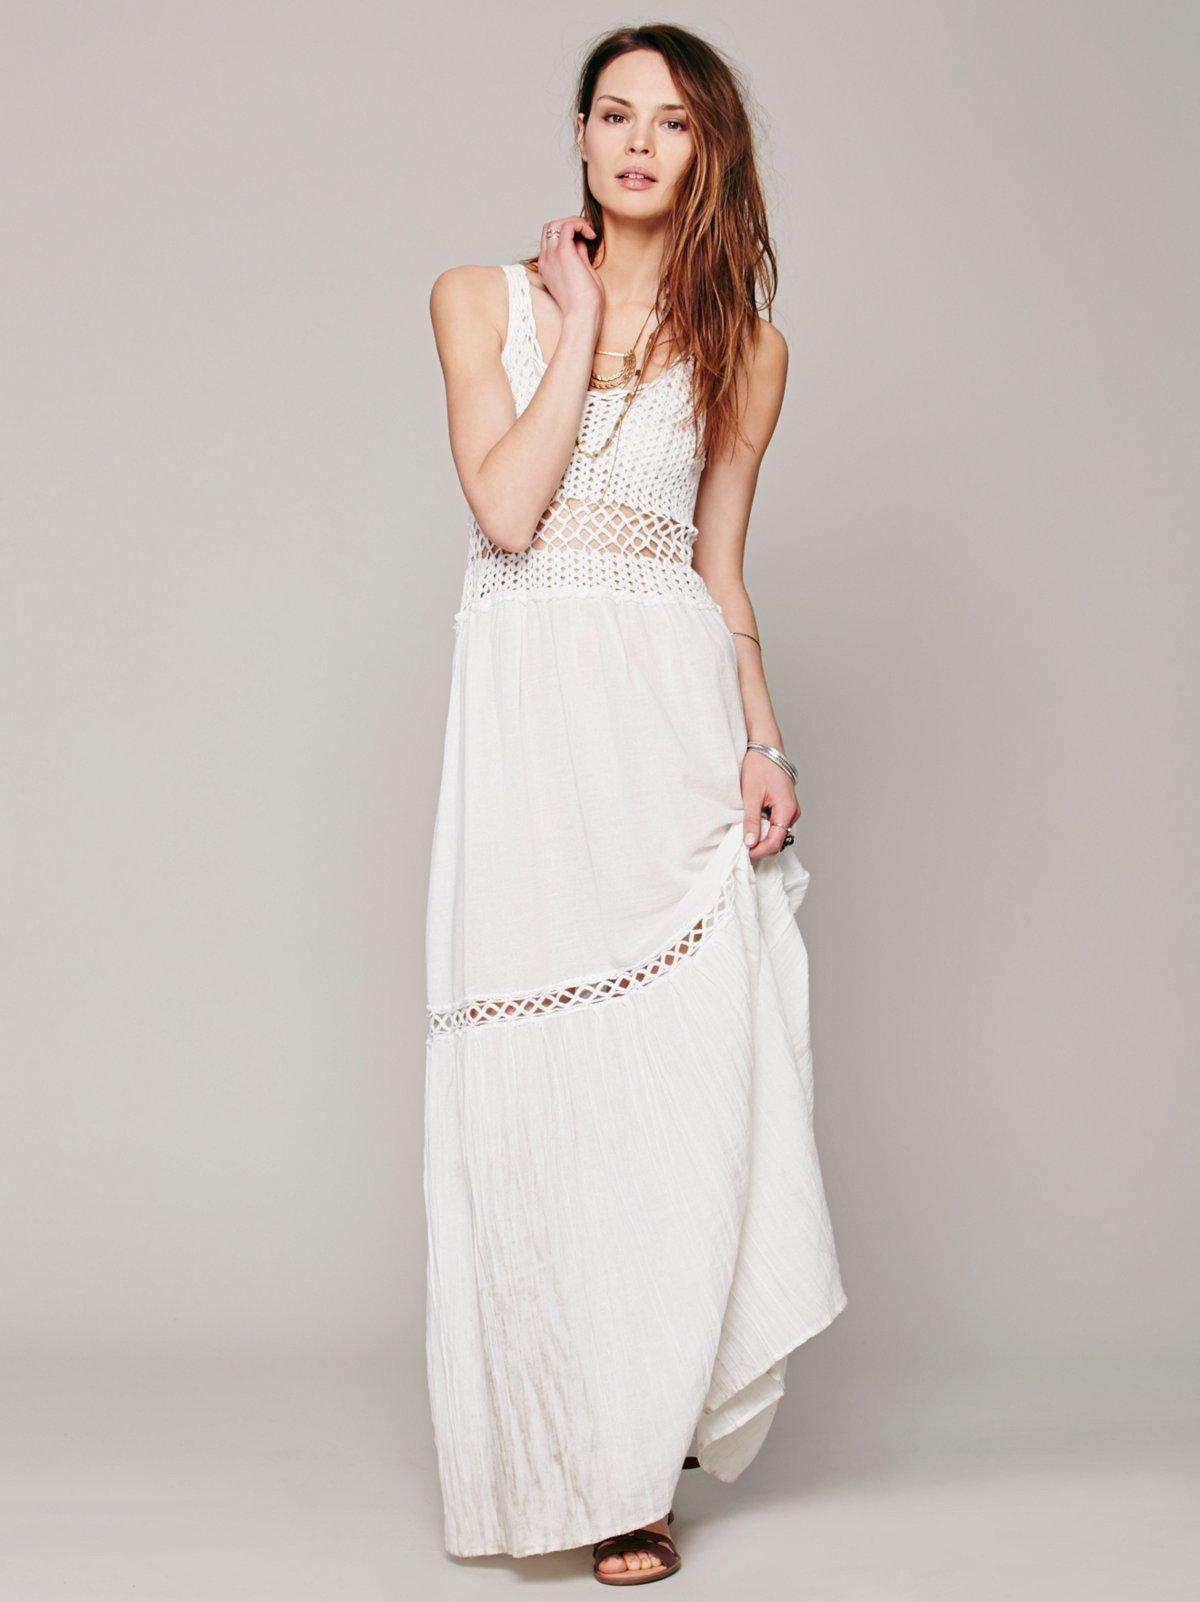 Clemintine Crochet Dress